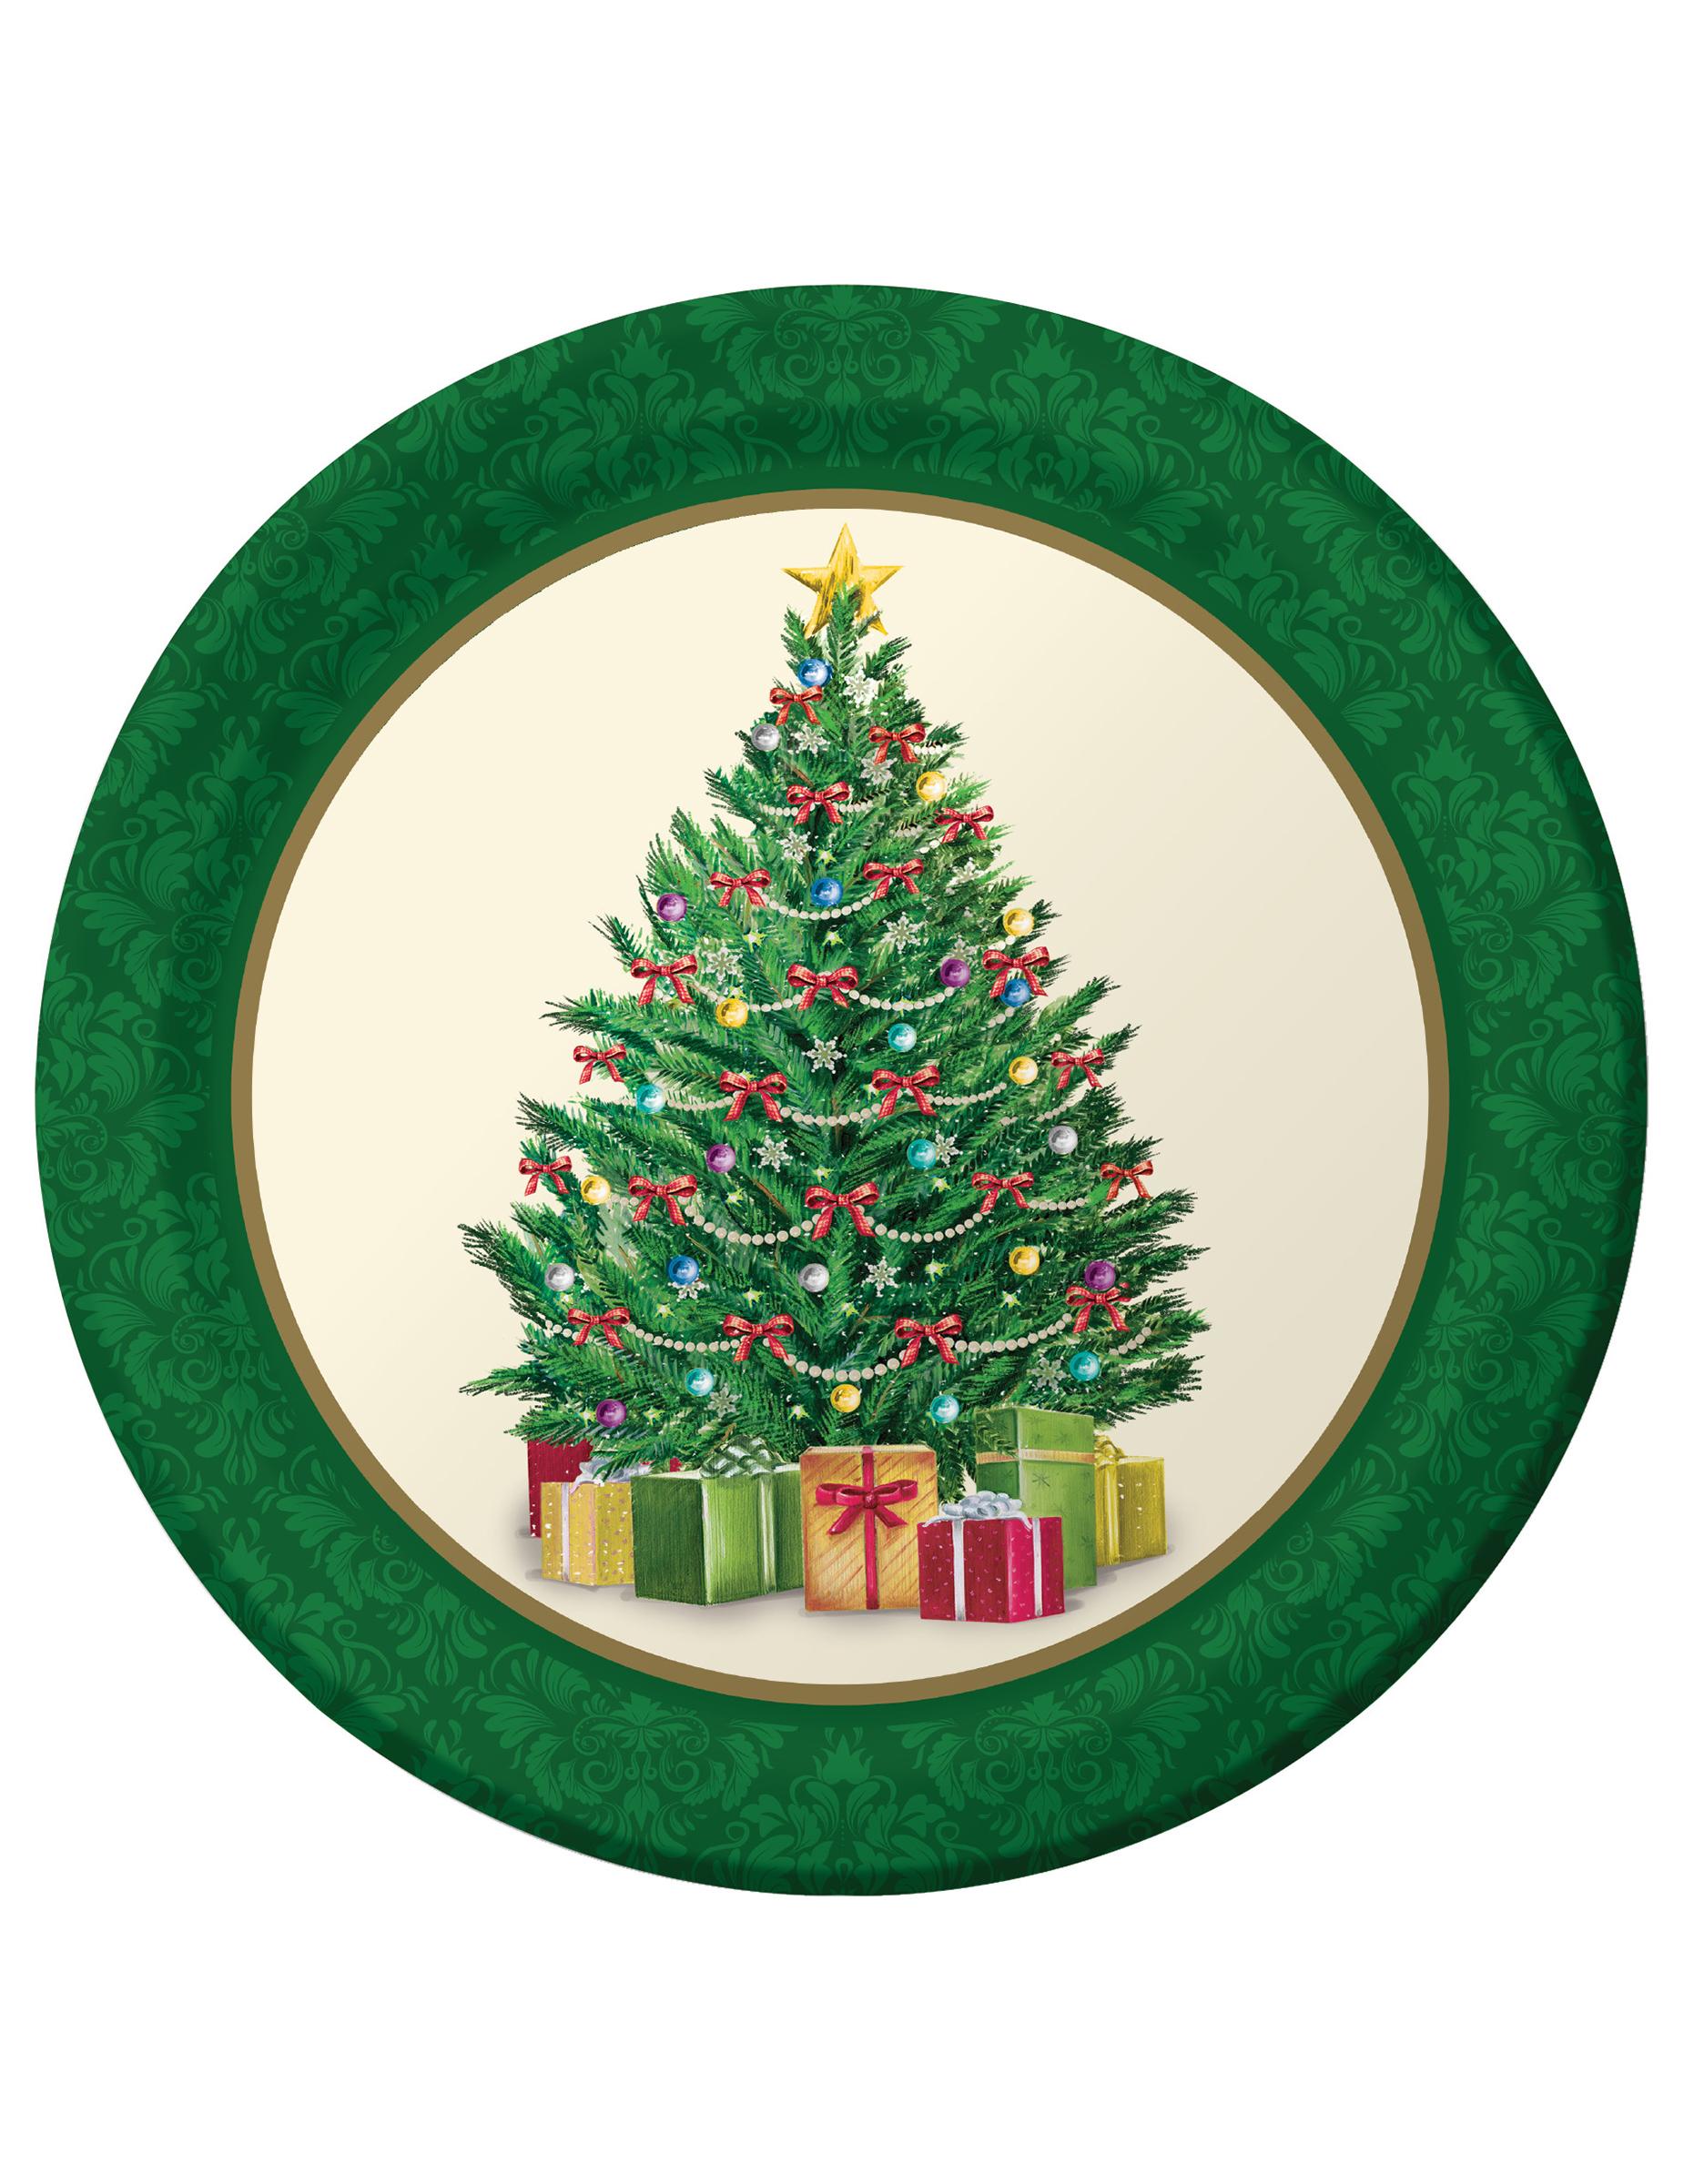 pappteller weihnachten 8 st ck bunt 23cm g nstige. Black Bedroom Furniture Sets. Home Design Ideas